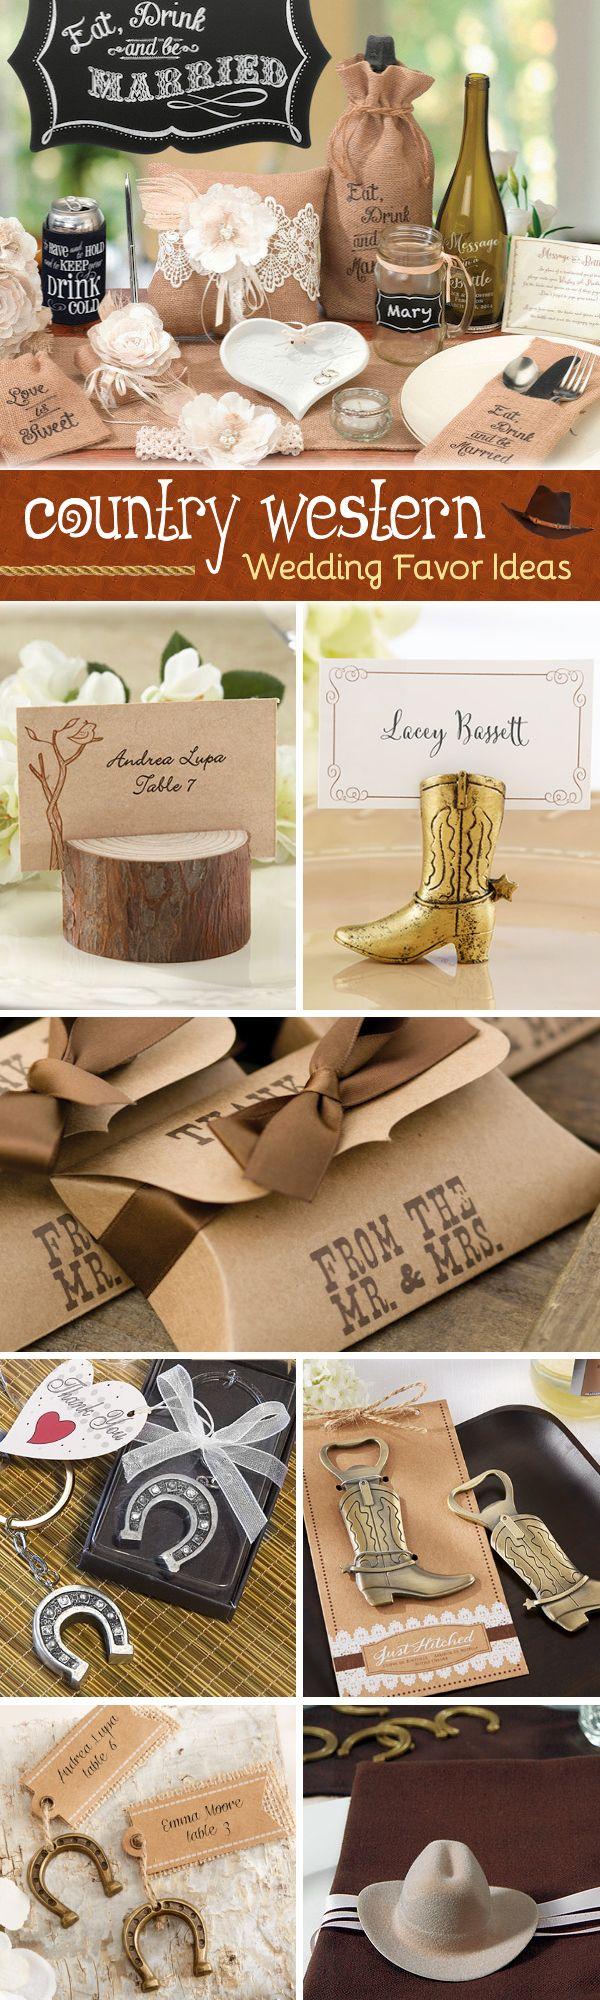 100 Country Western Rustic Wedding Favor Ideas